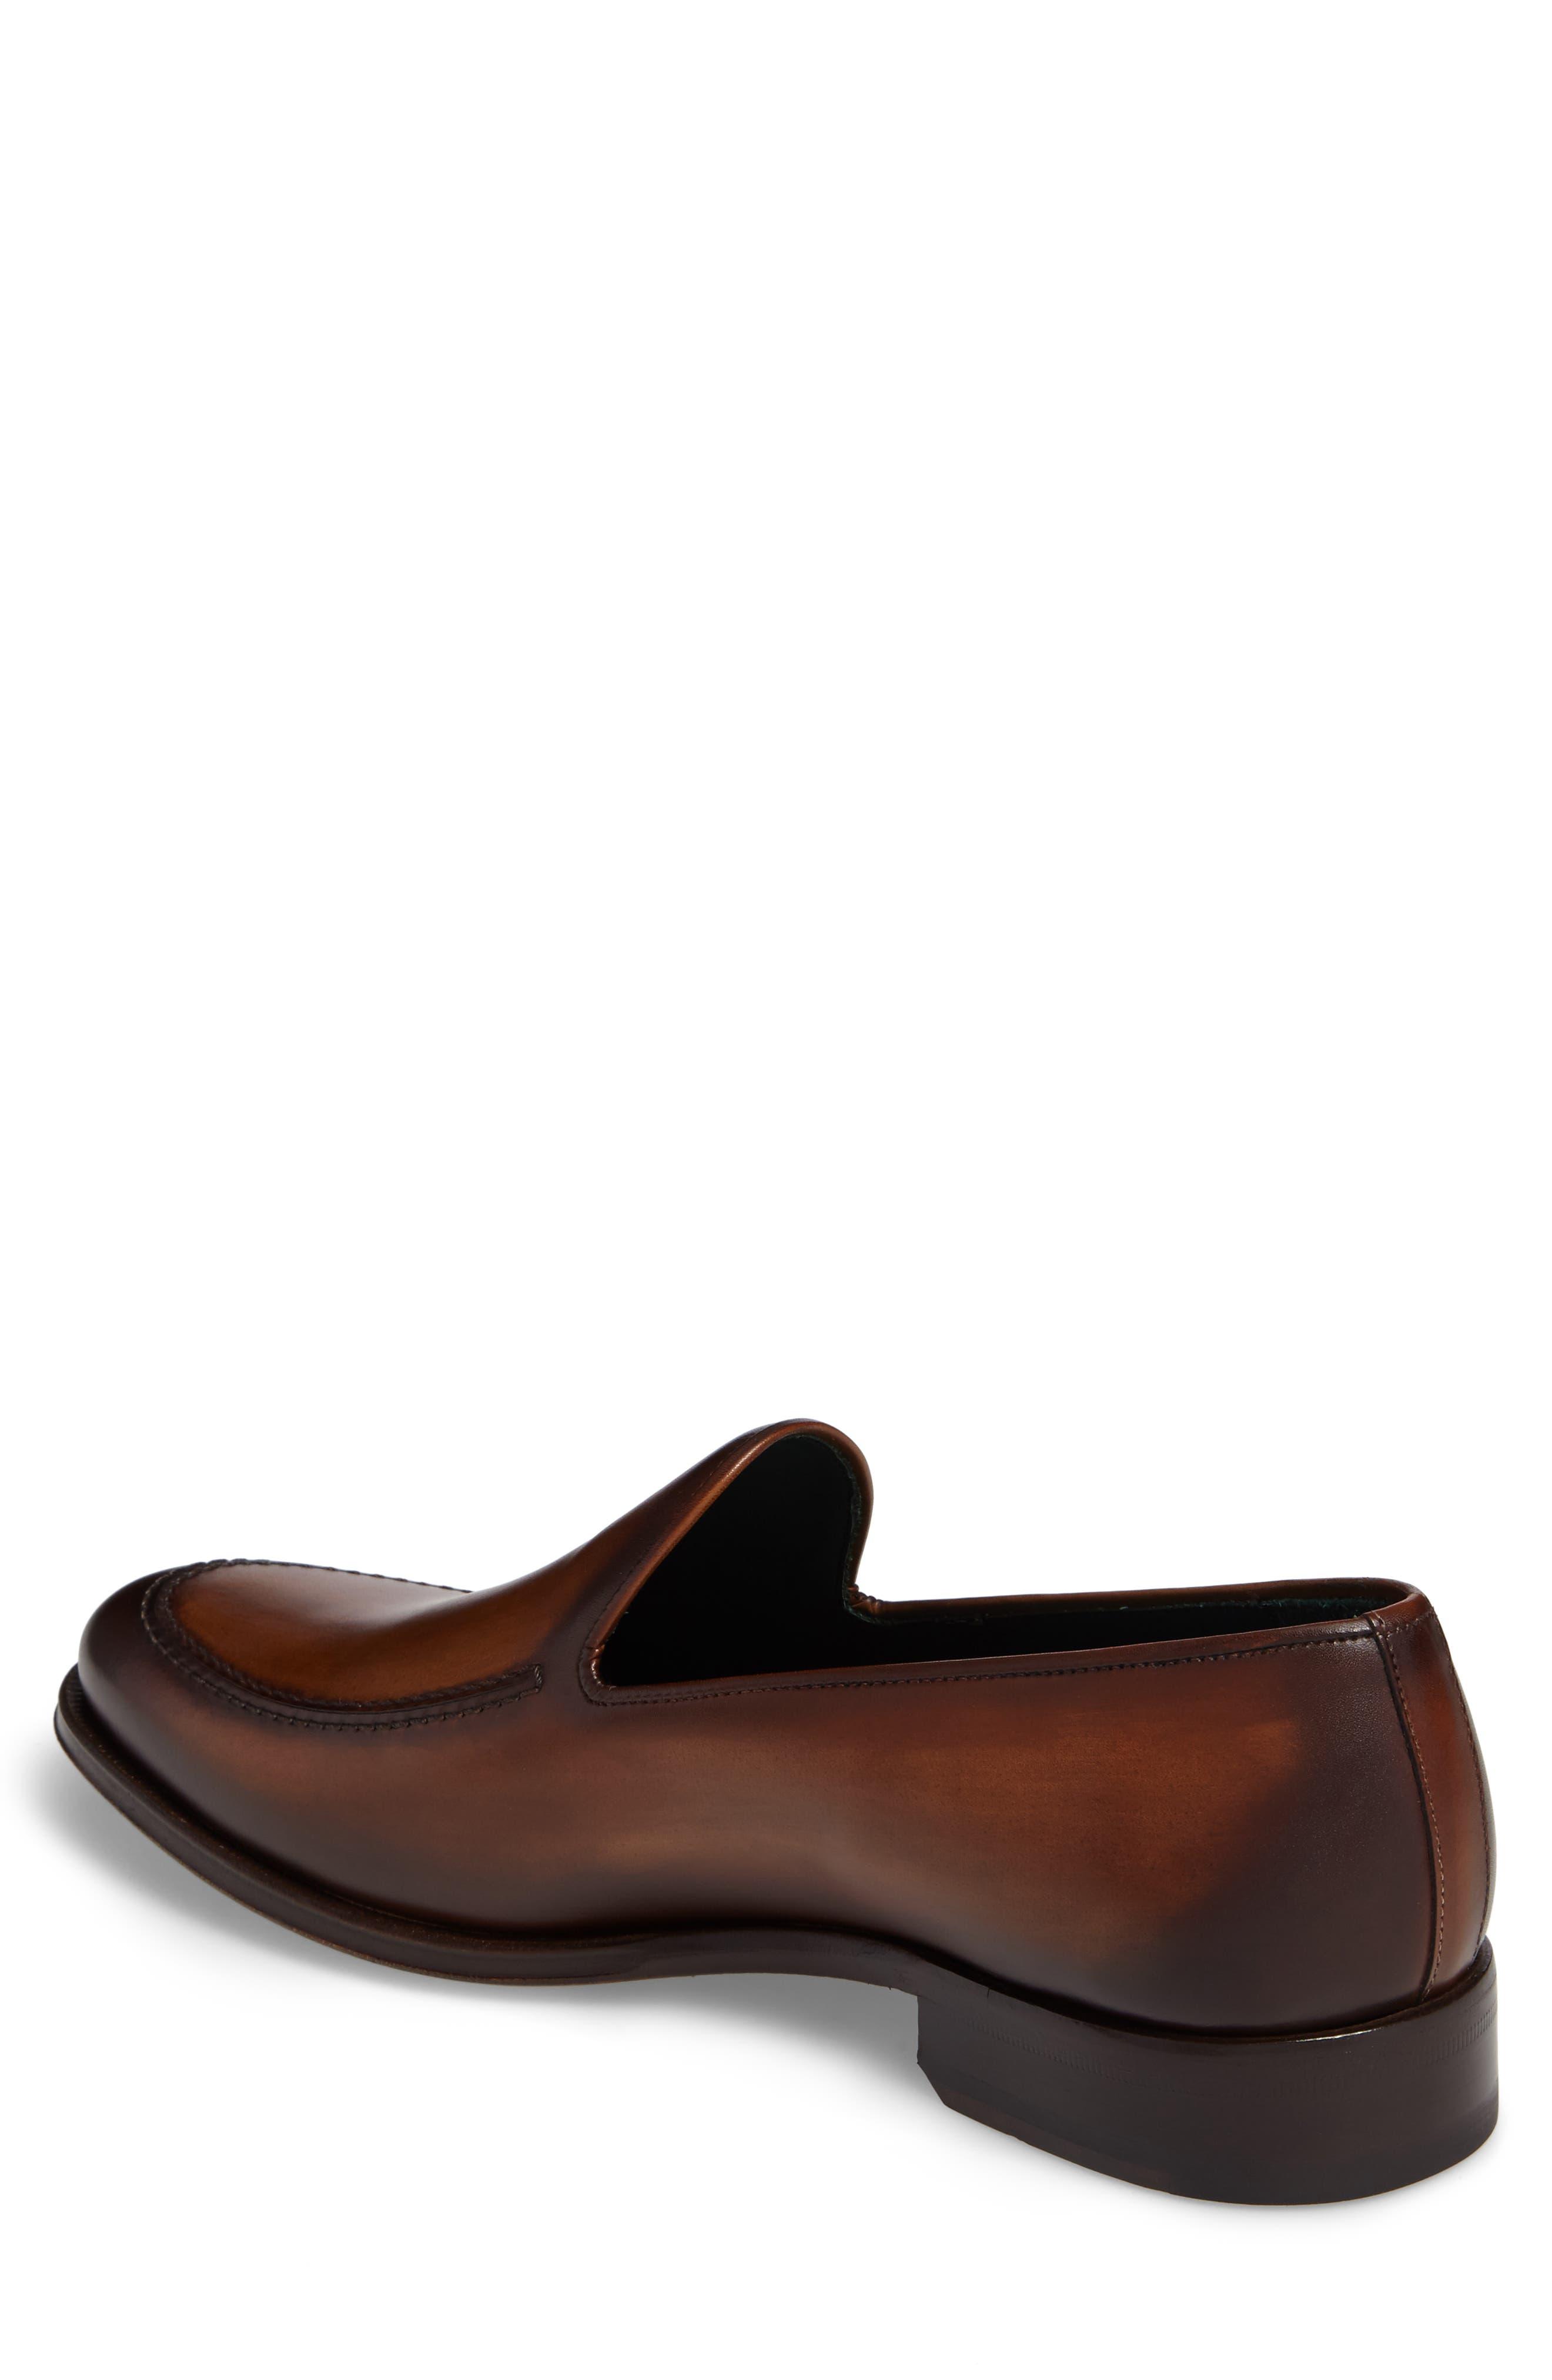 Rodin Apron Toe Loafer,                             Alternate thumbnail 2, color,                             Cognac Leather